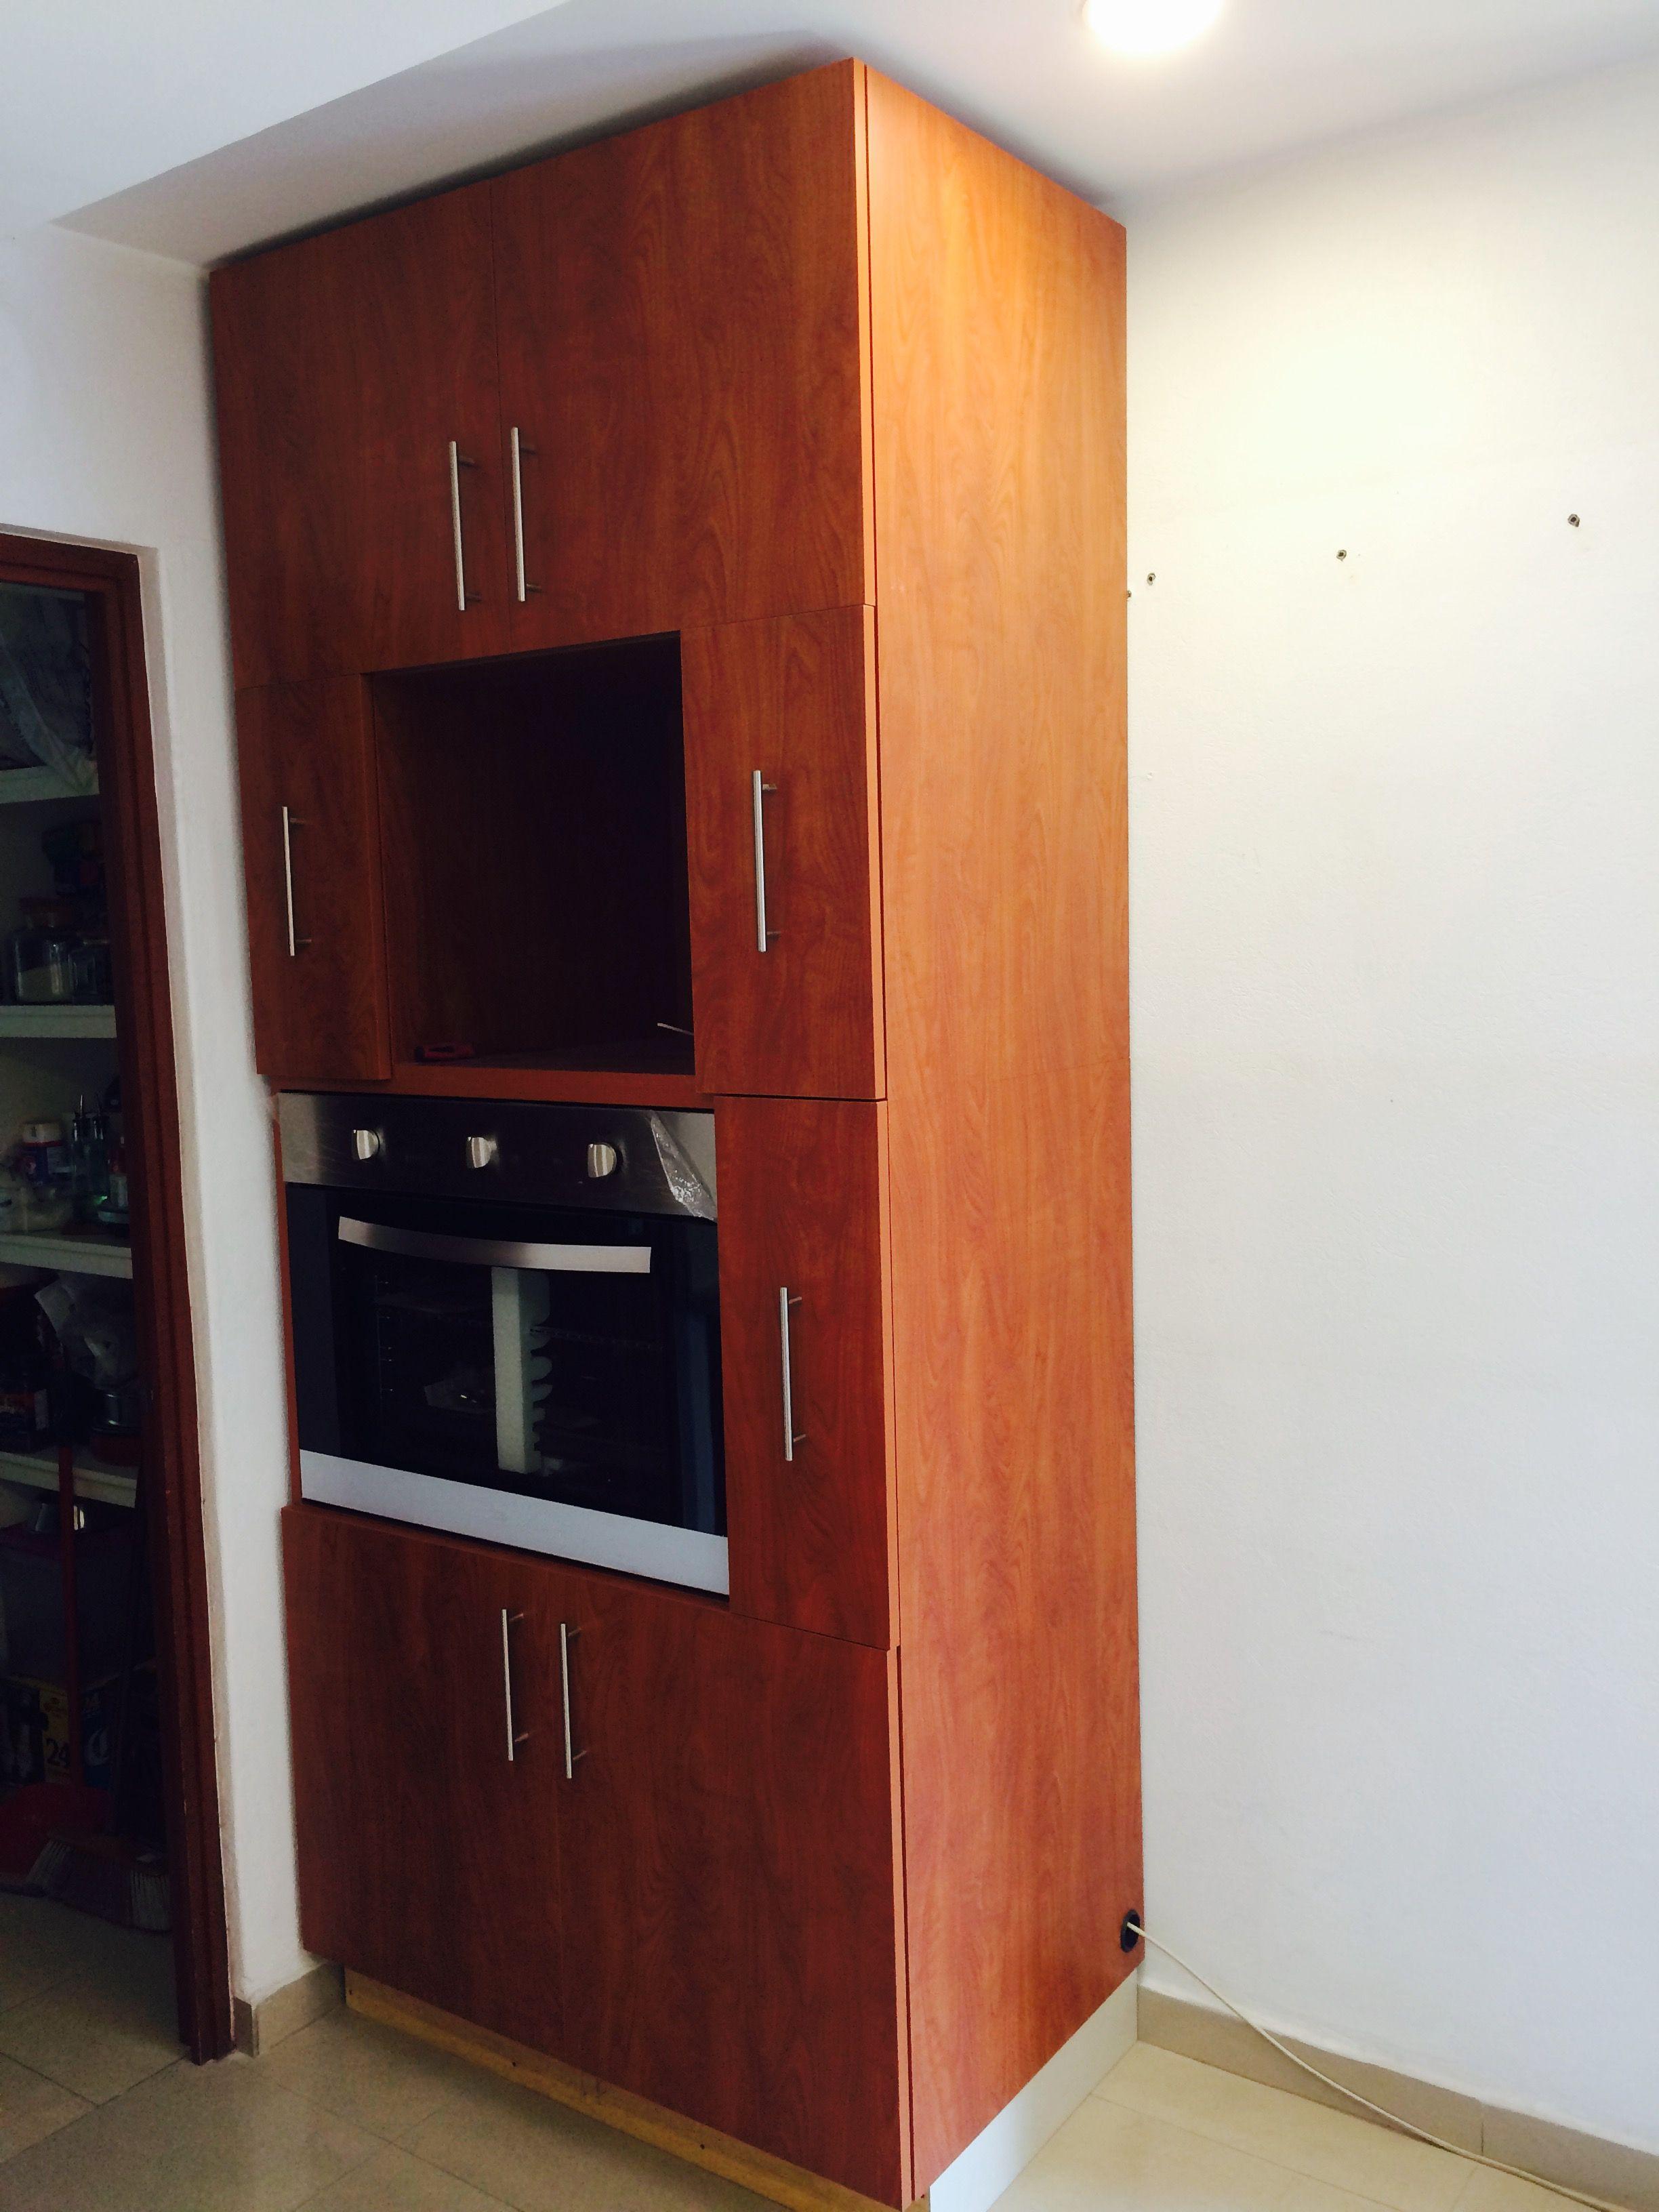 Pin De Alberto Segura Peralta Muebles Sobre Dise O En Cocinas  # Muebles Peralta